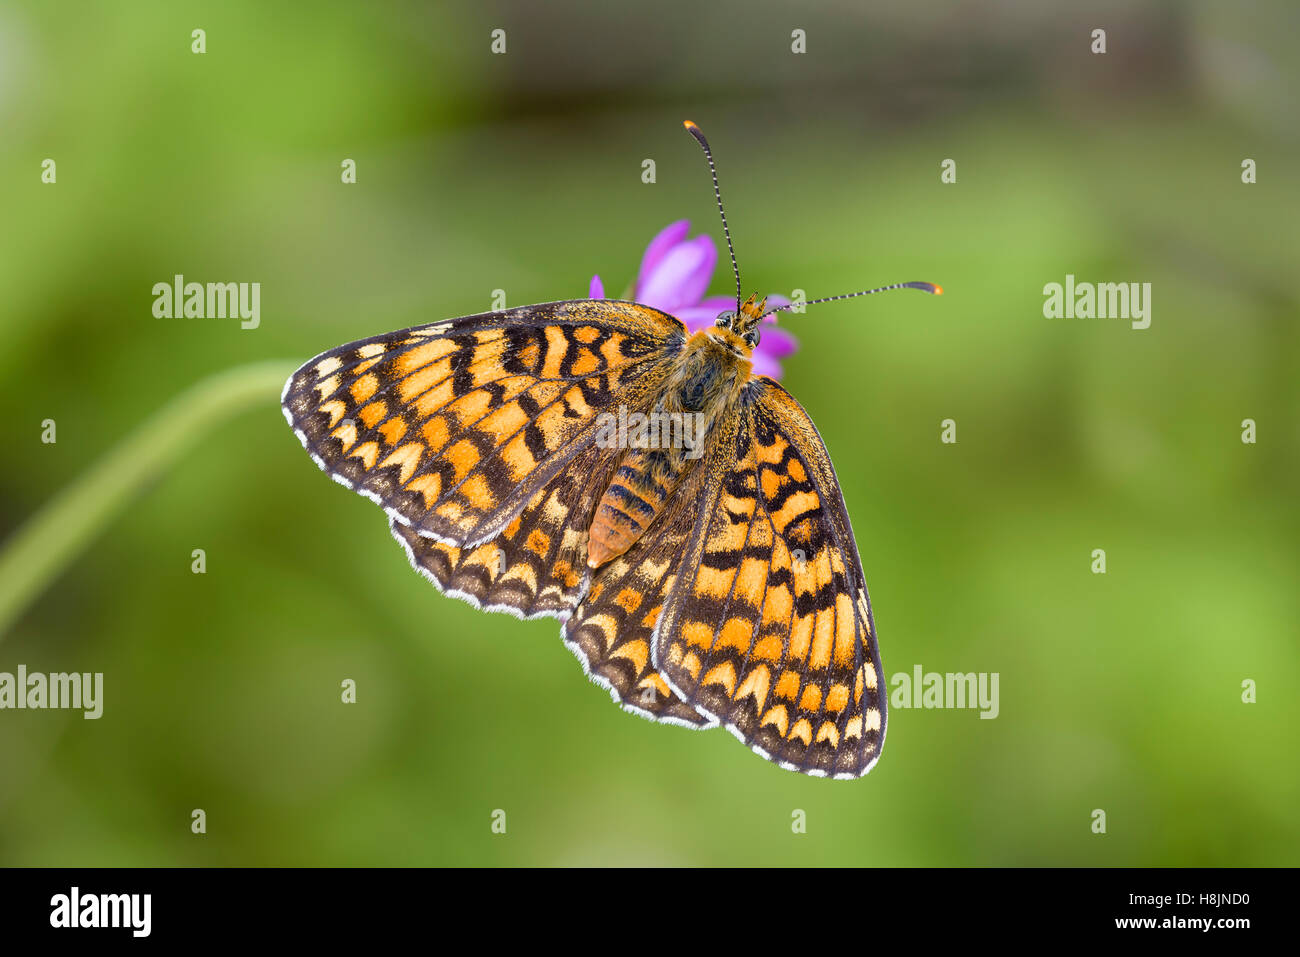 Flockenblumen-Scheckenfalter, Melitaea Phoebe, Flockenblume Fritillary Butterfly Stockbild